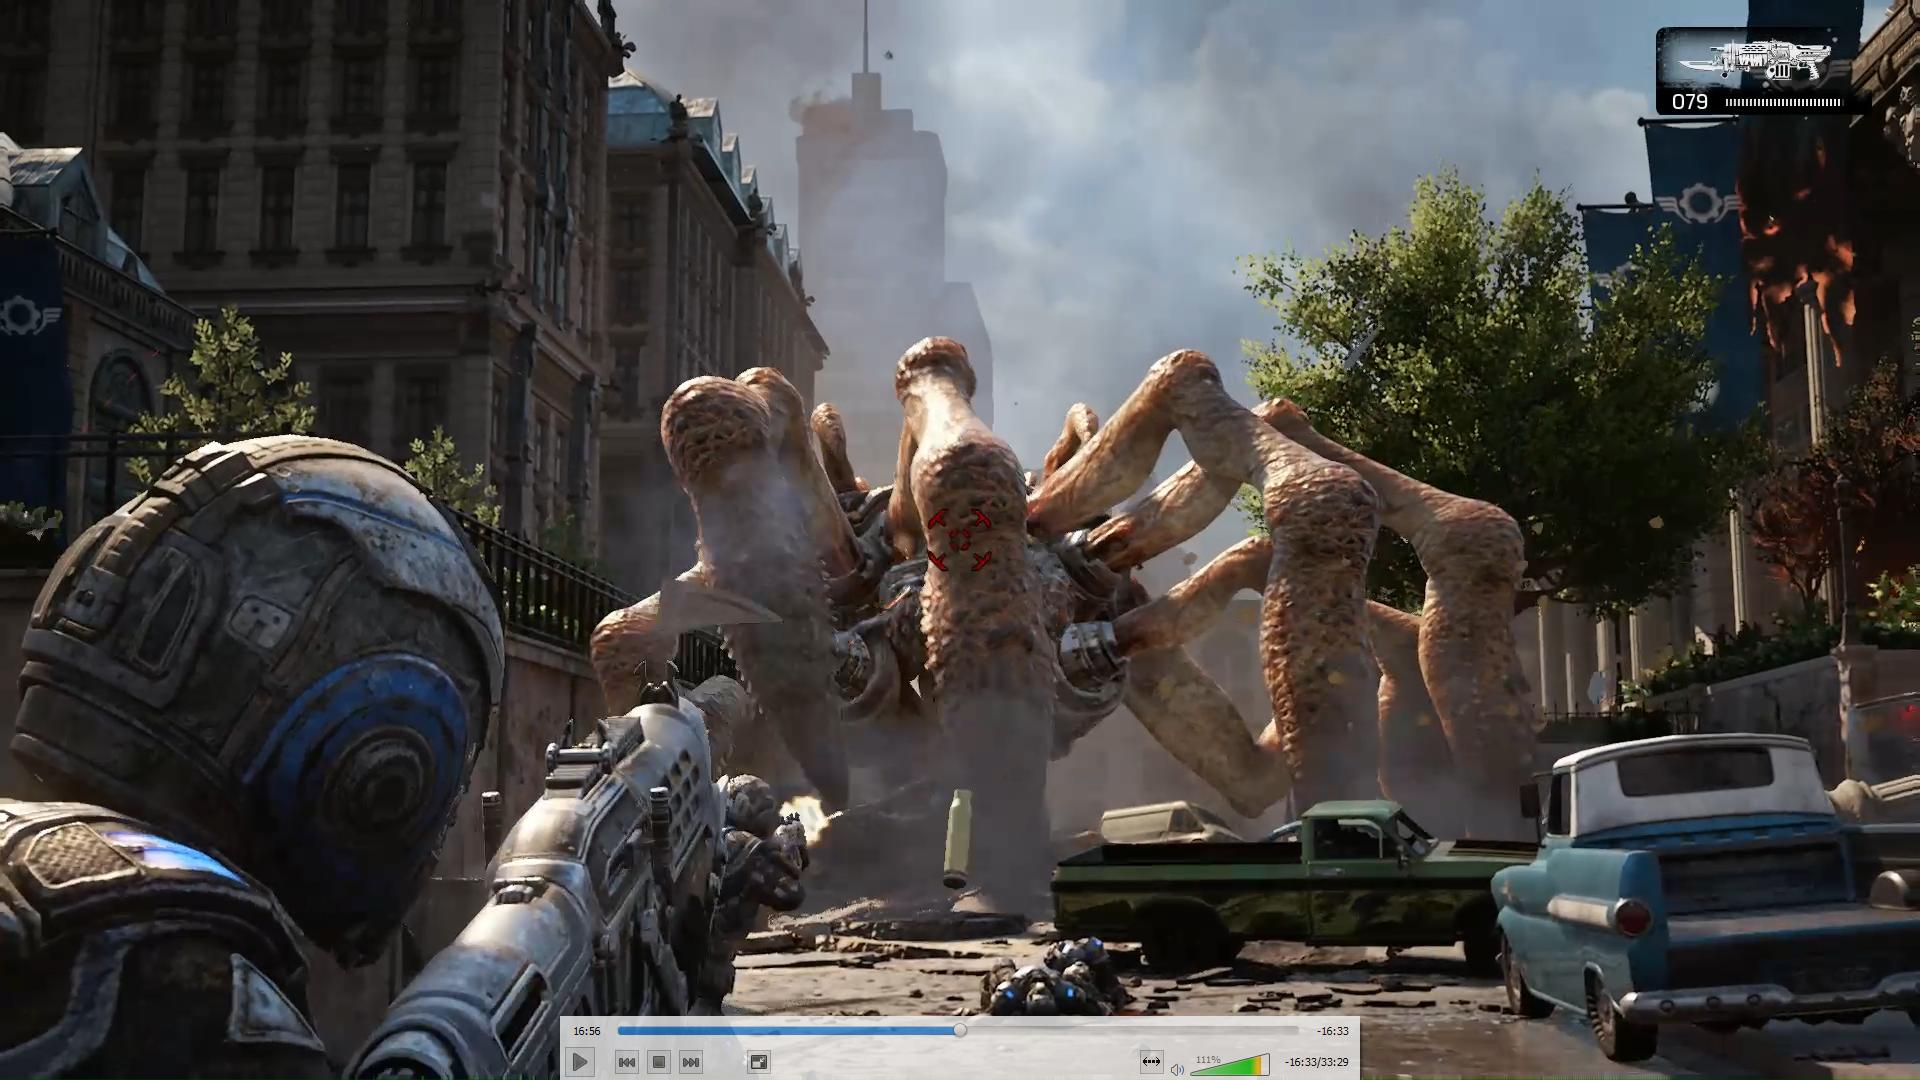 Gears of War 4 screenshotGears of War 4 screenshot